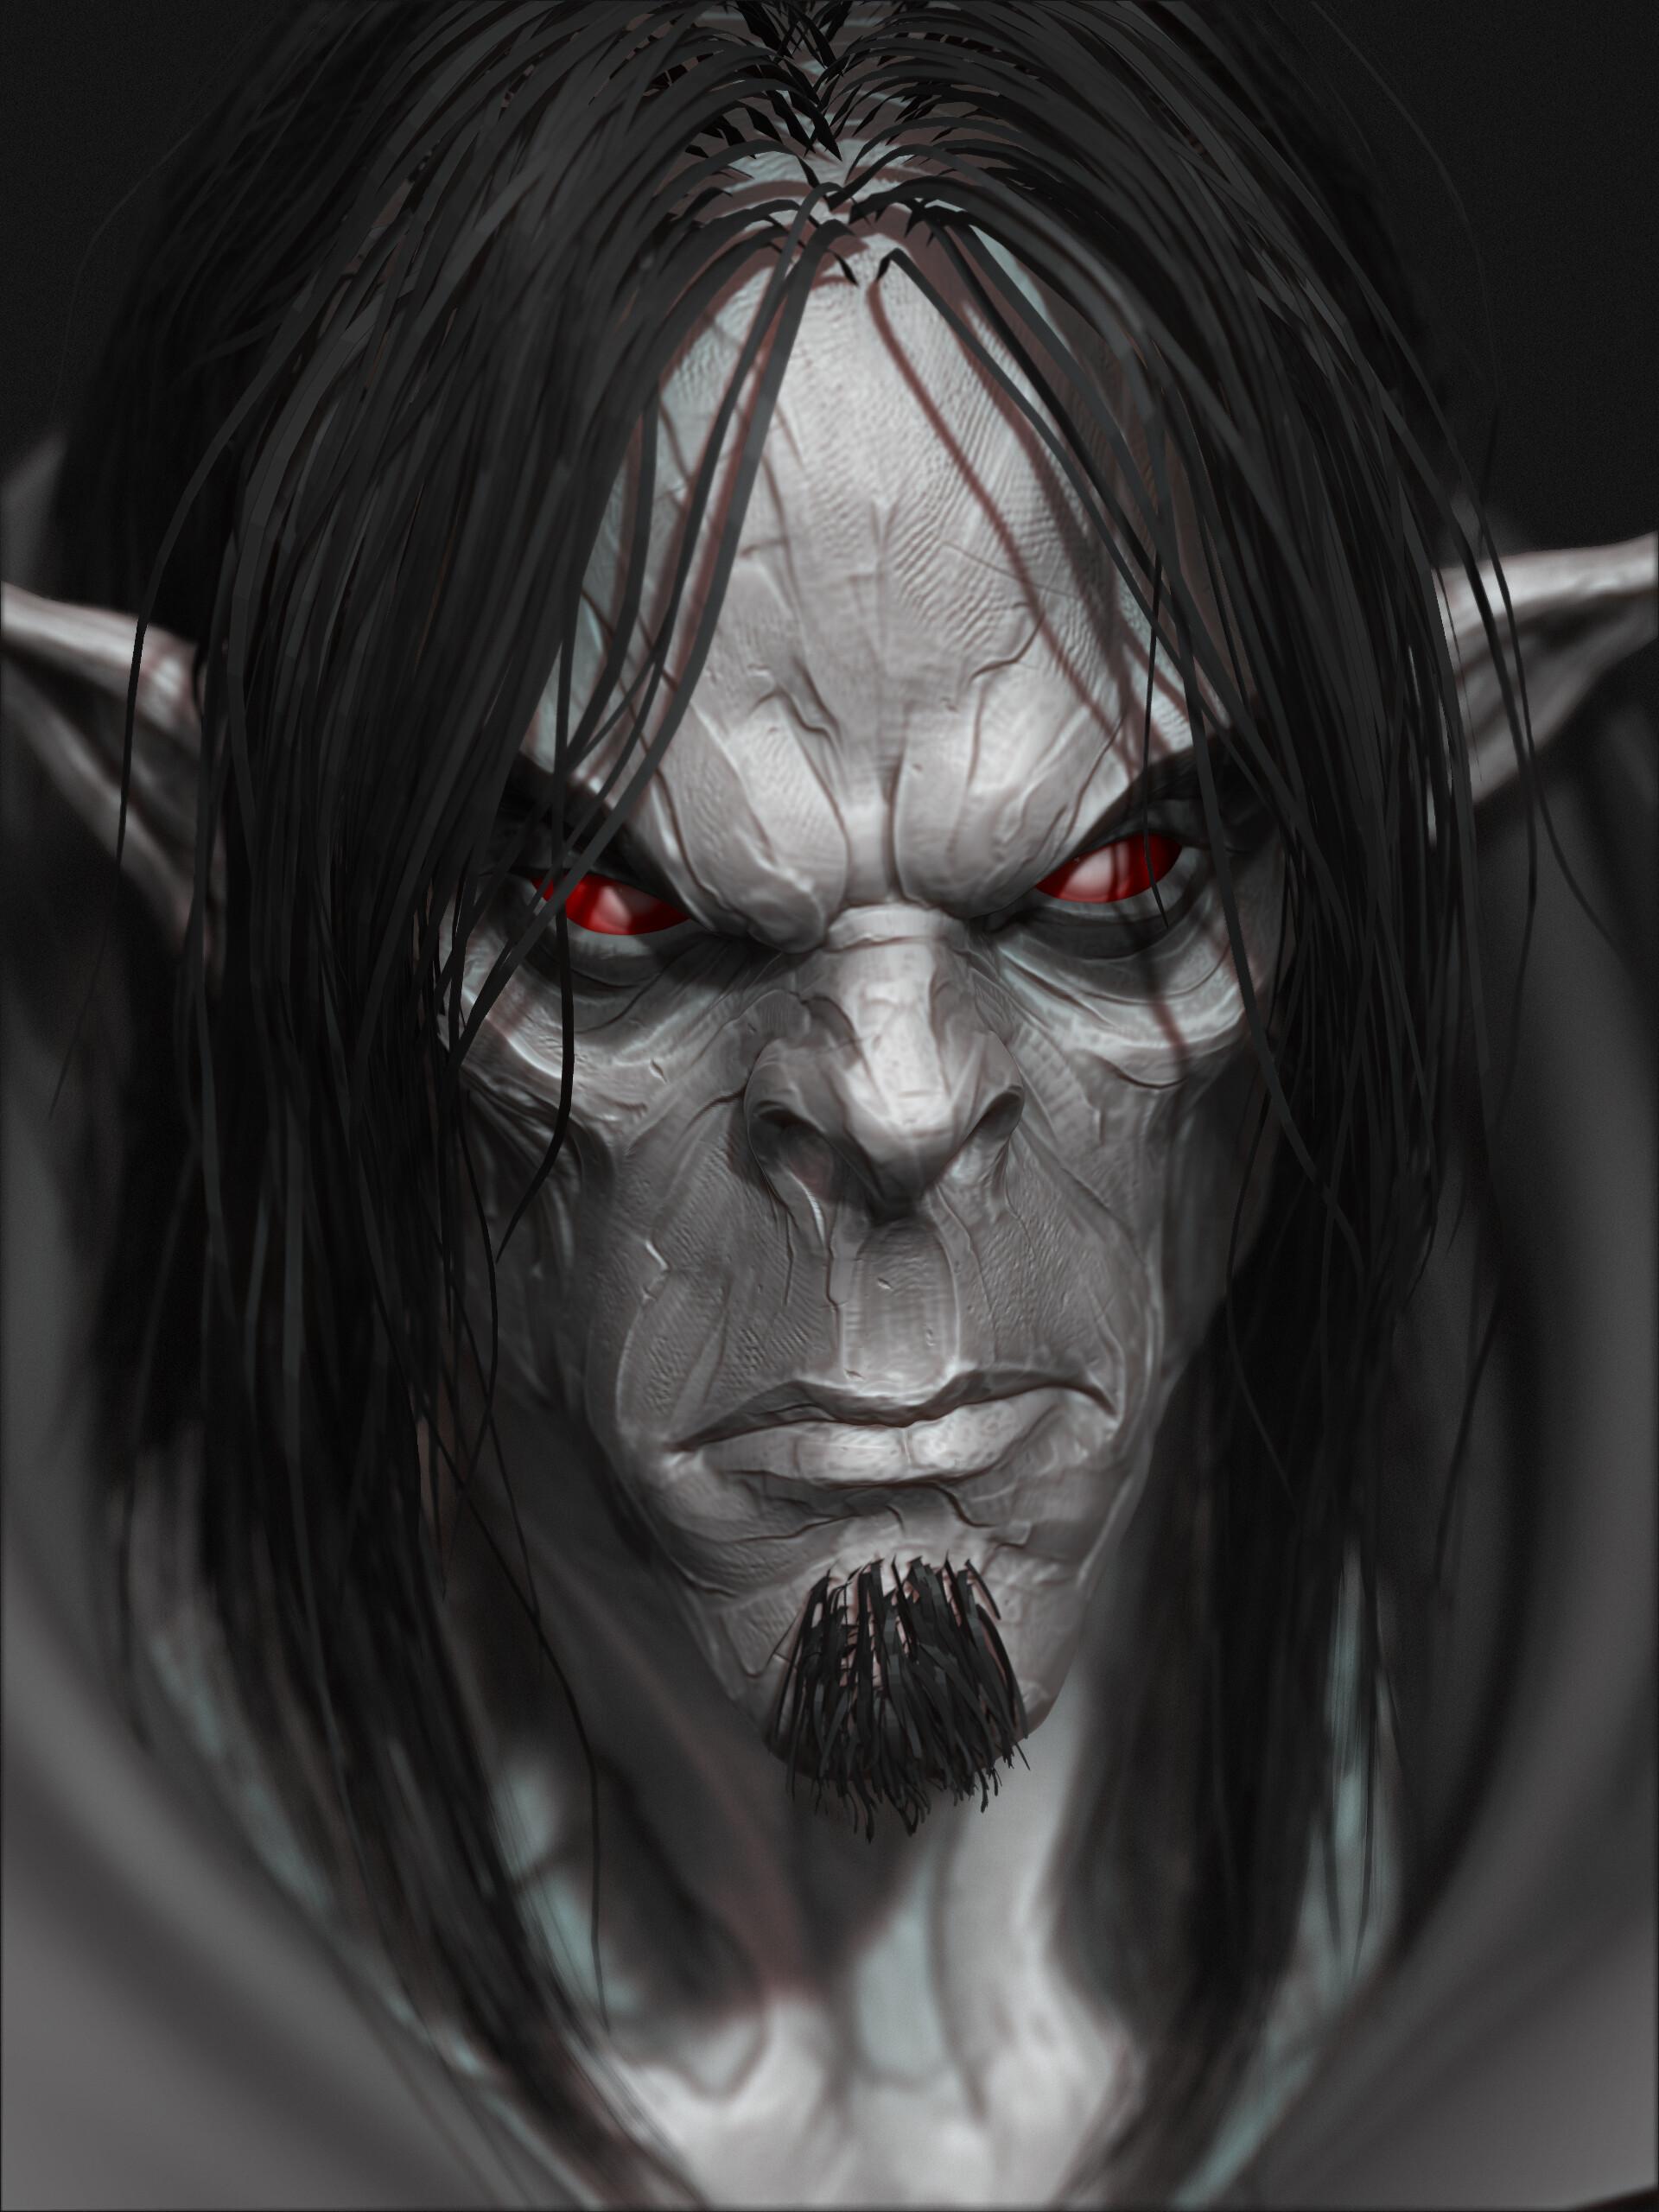 Poligone cg morbius 1